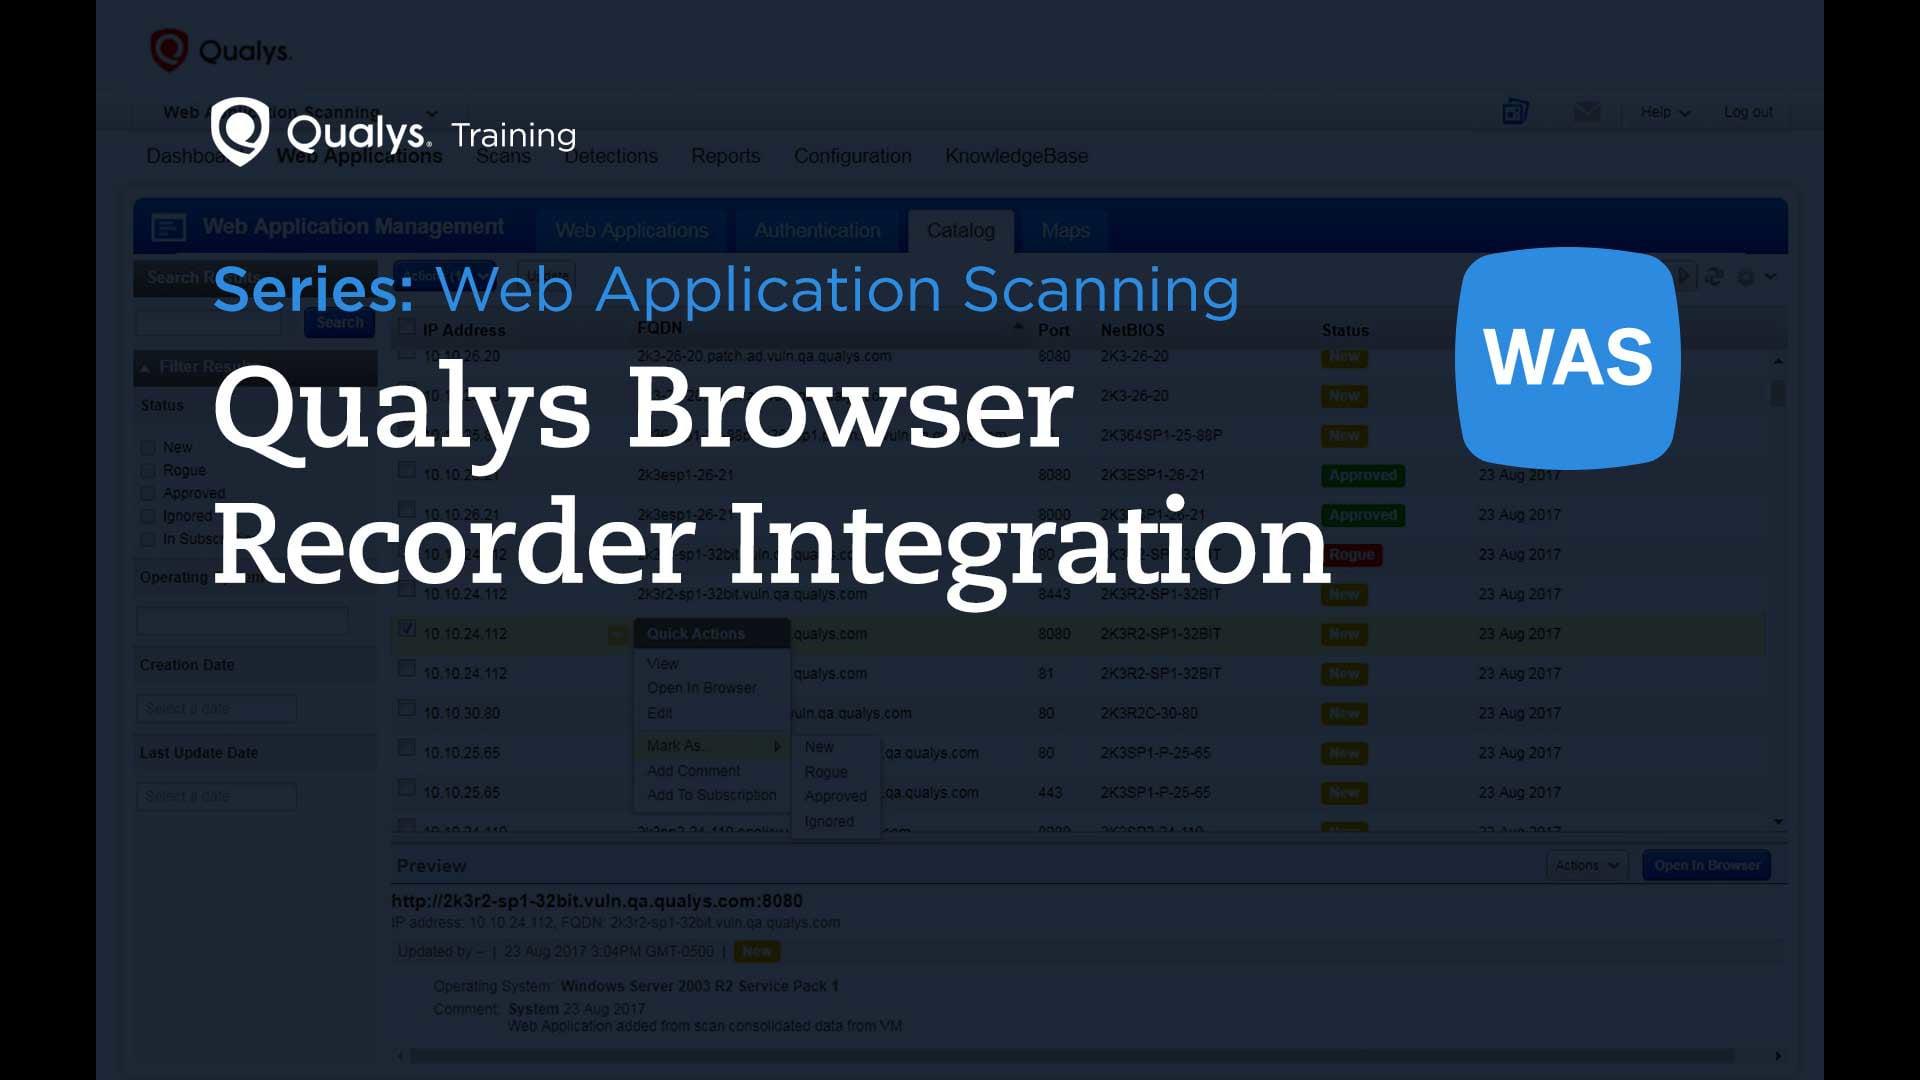 Qualys Browser Recorder Integration